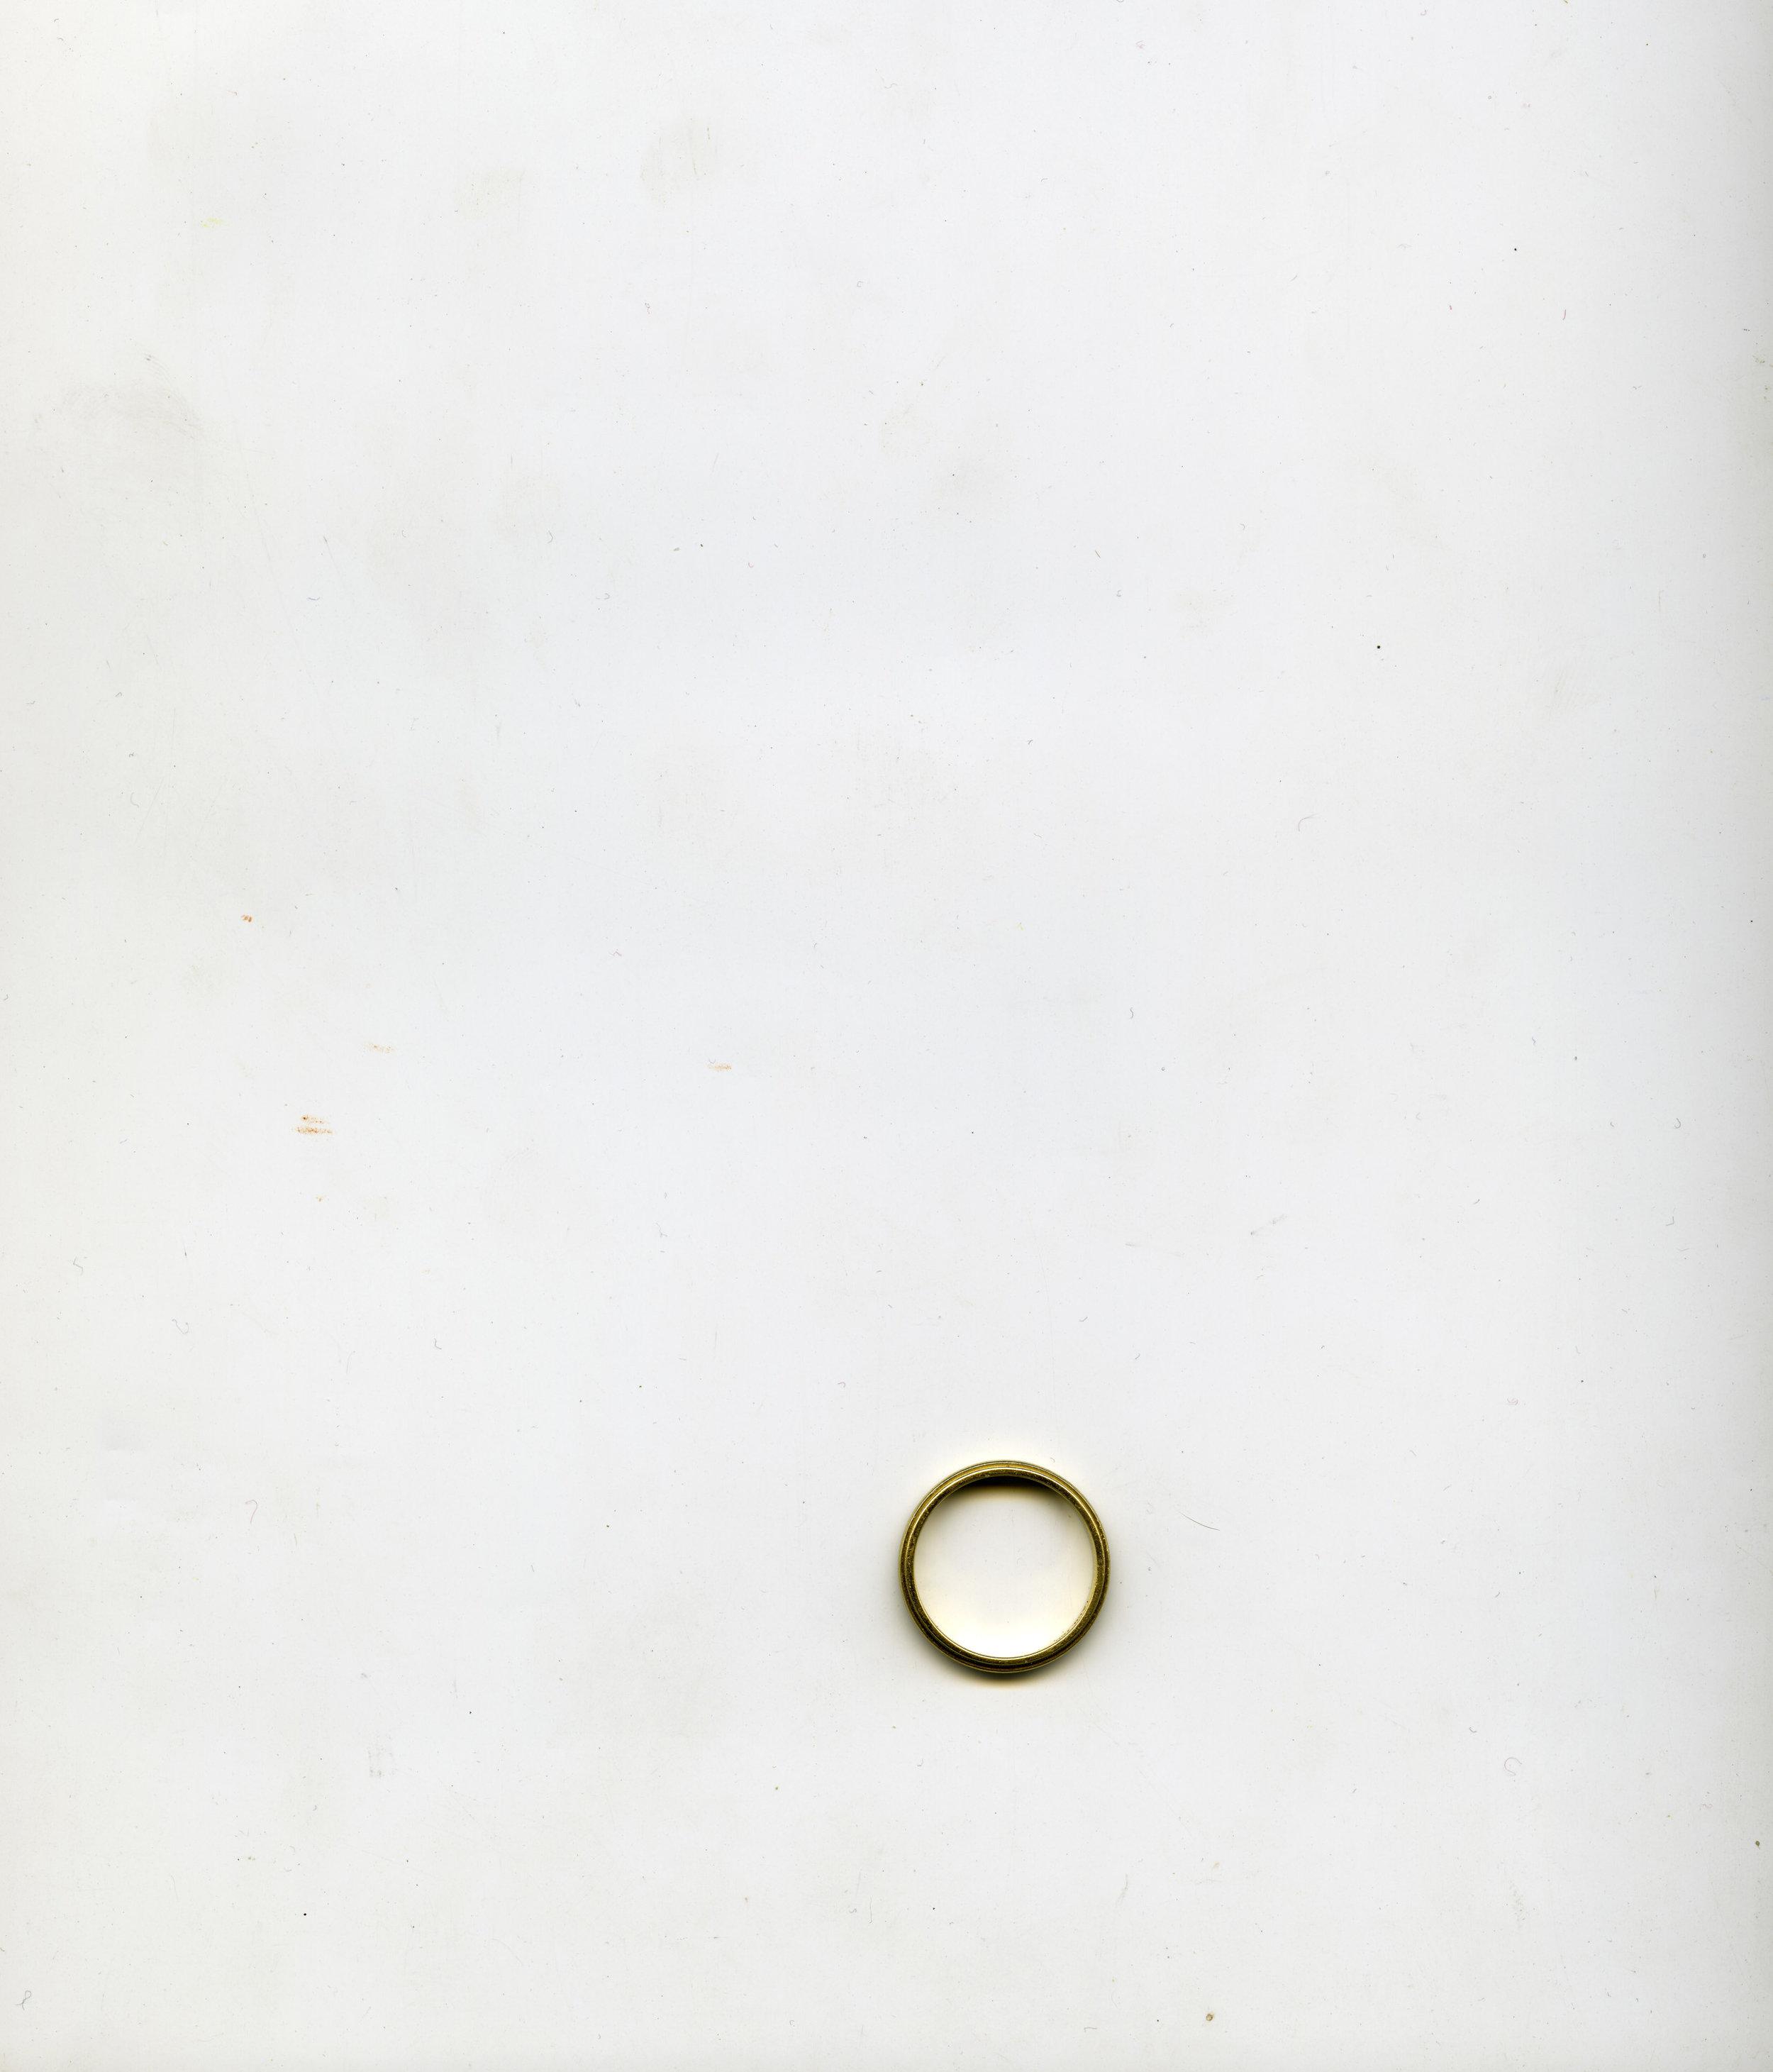 Ring010.jpg